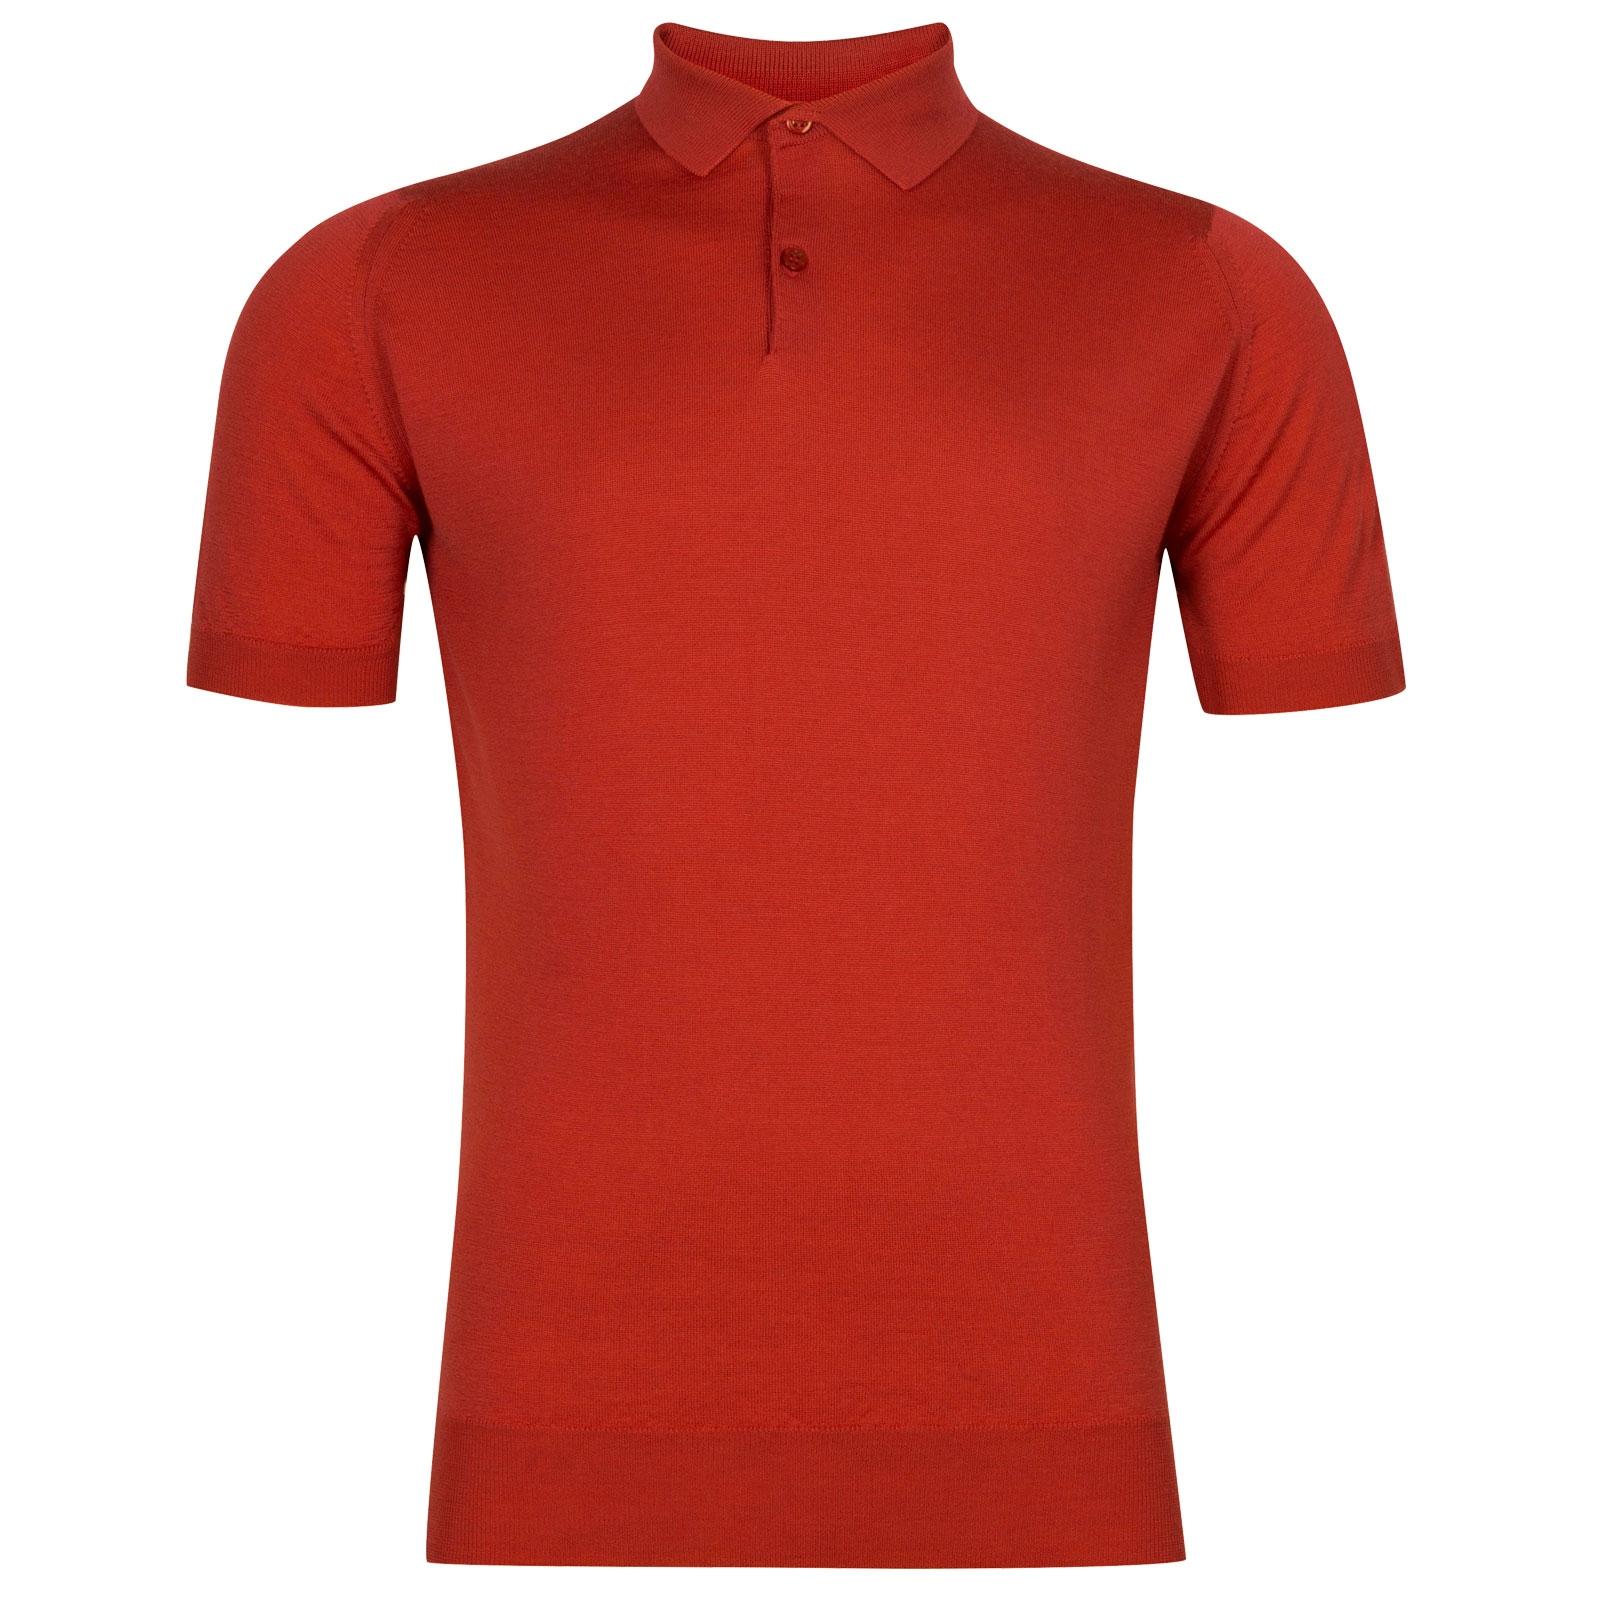 John Smedley Payton in Red Admiral Shirt-LGE